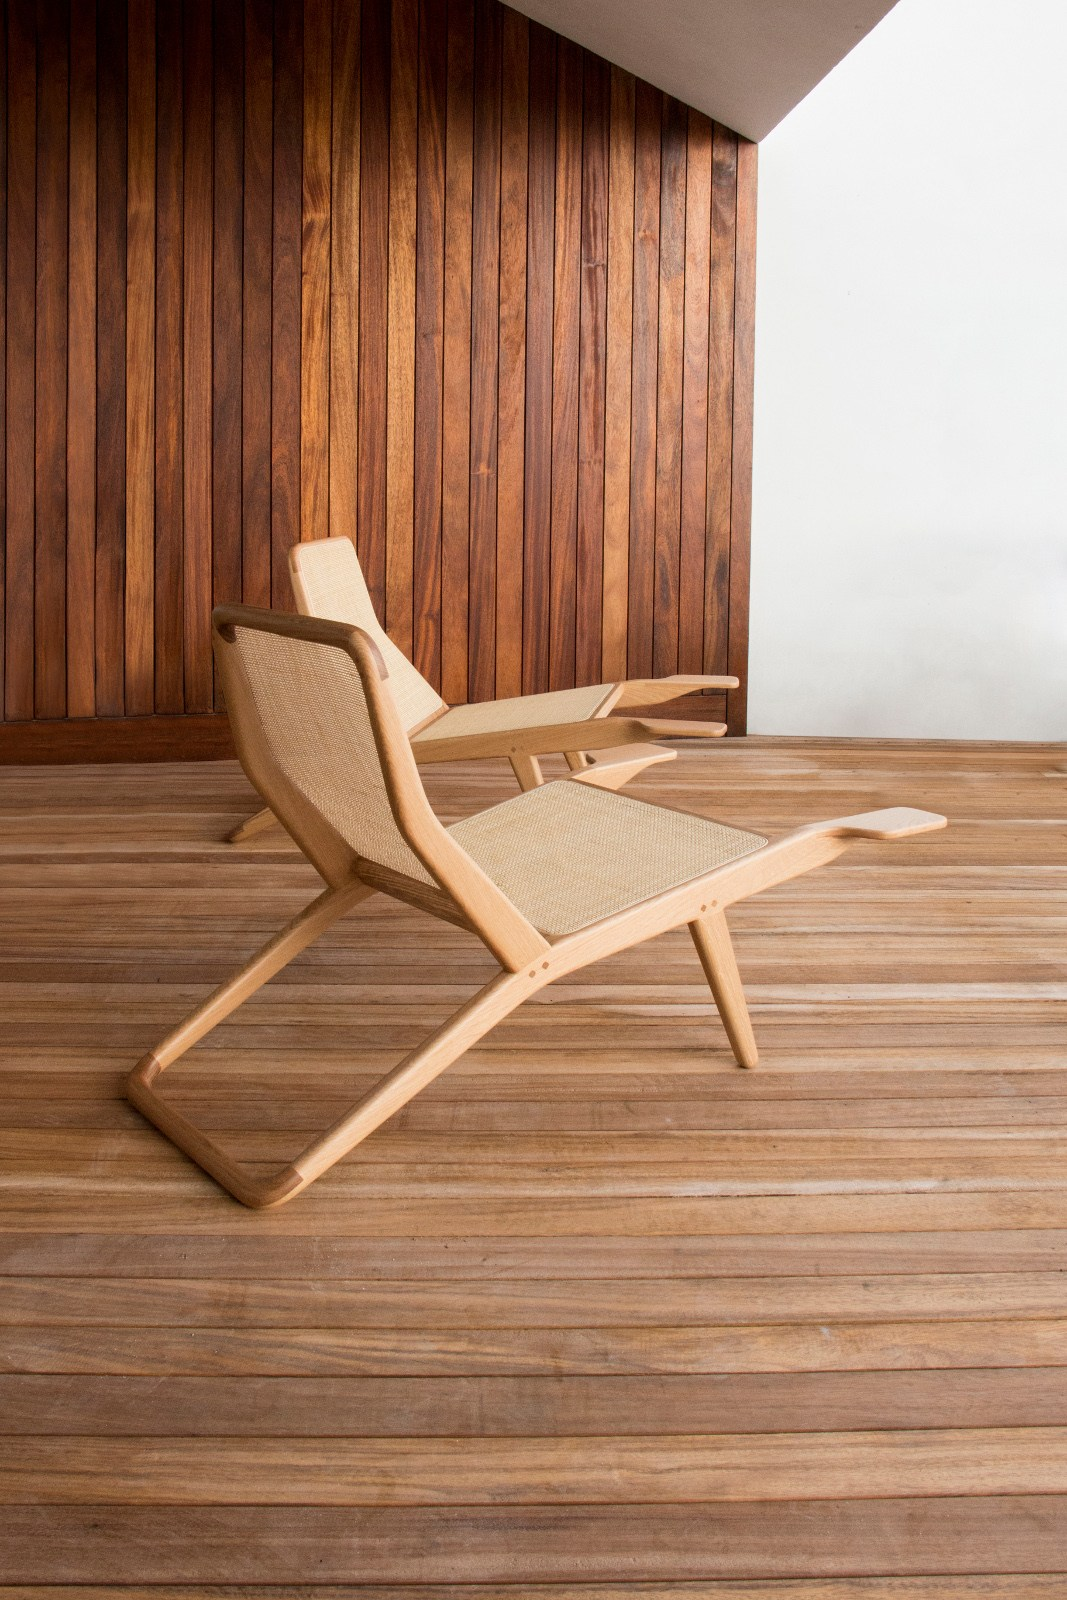 Groovy Barca Lounge Chair By Branca Lisboa Sohomod Blog Theyellowbook Wood Chair Design Ideas Theyellowbookinfo